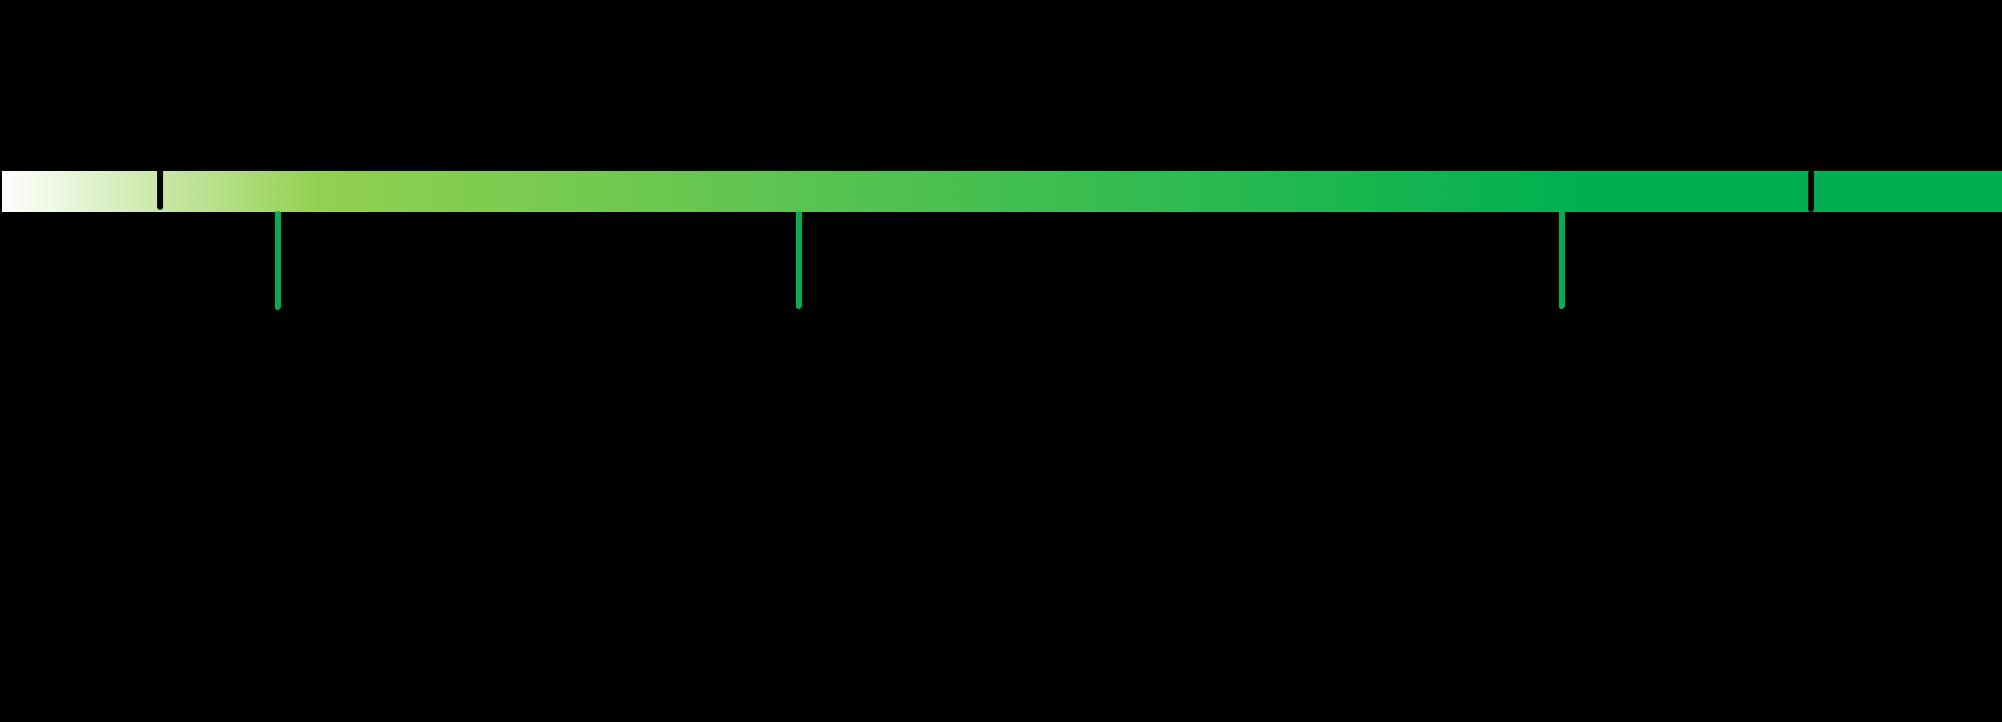 Image 1. X-Road technical release roadmap 2019.